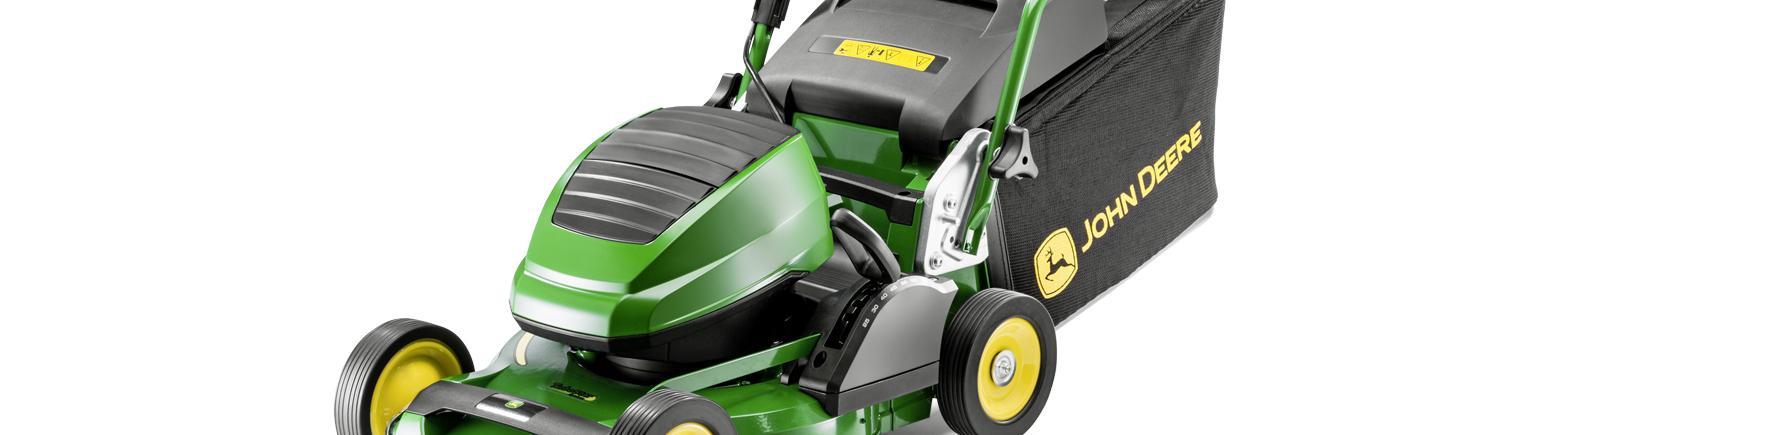 New John Deere PROcrop 43B header commercial battery mower